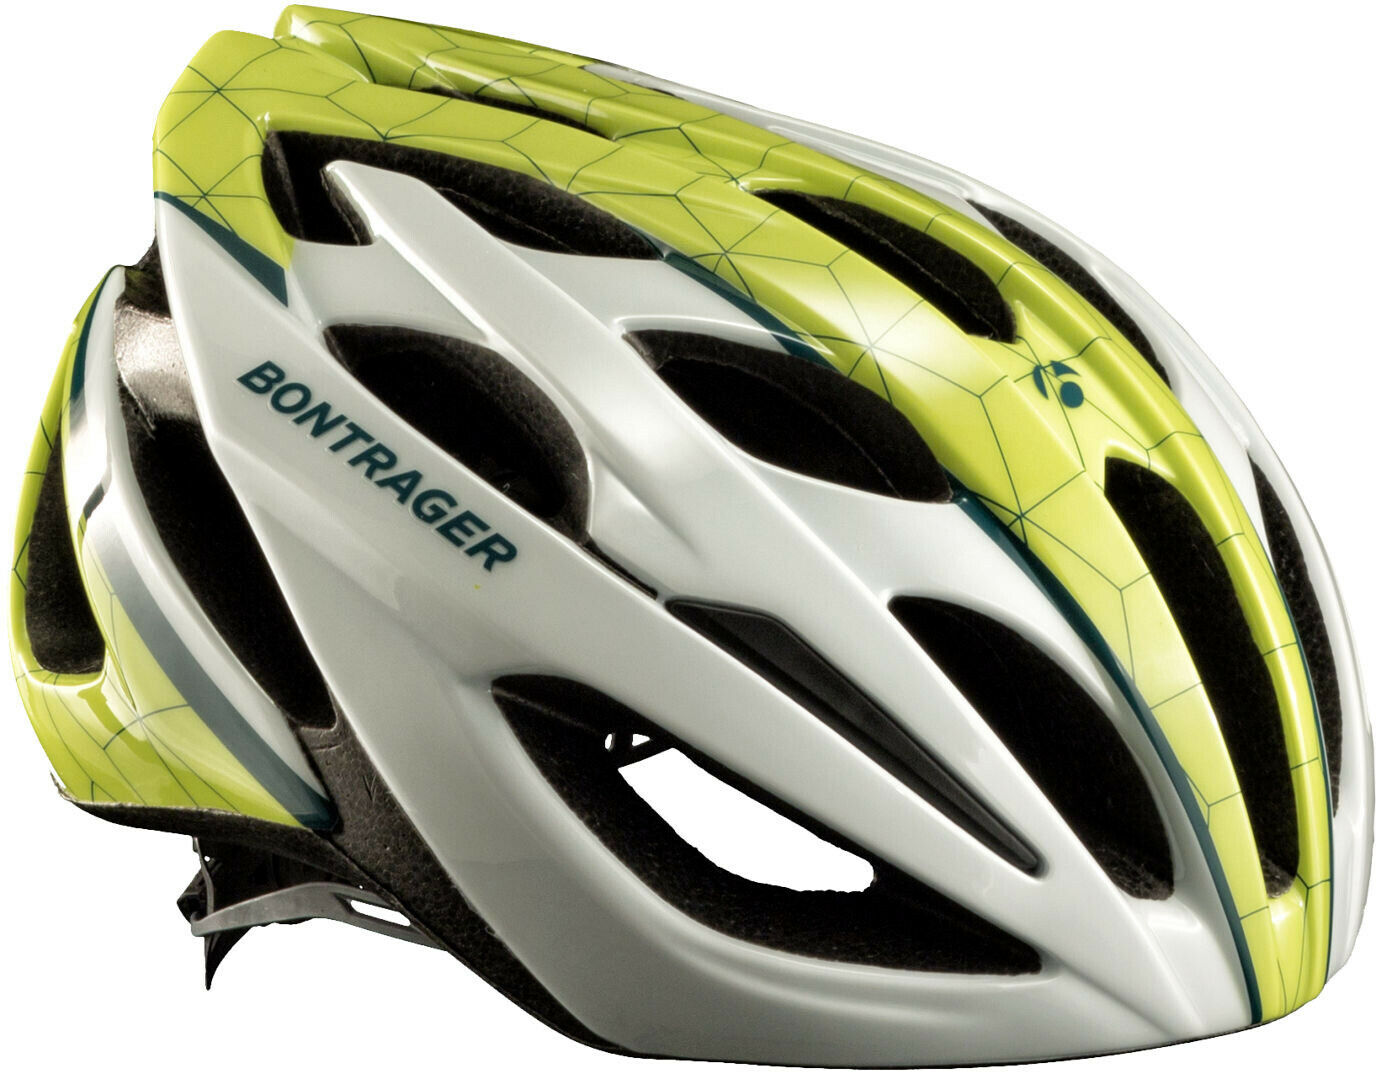 Bontrager Starvos - Size Small Bike Helmet 506391  - White Yellow  lowest prices